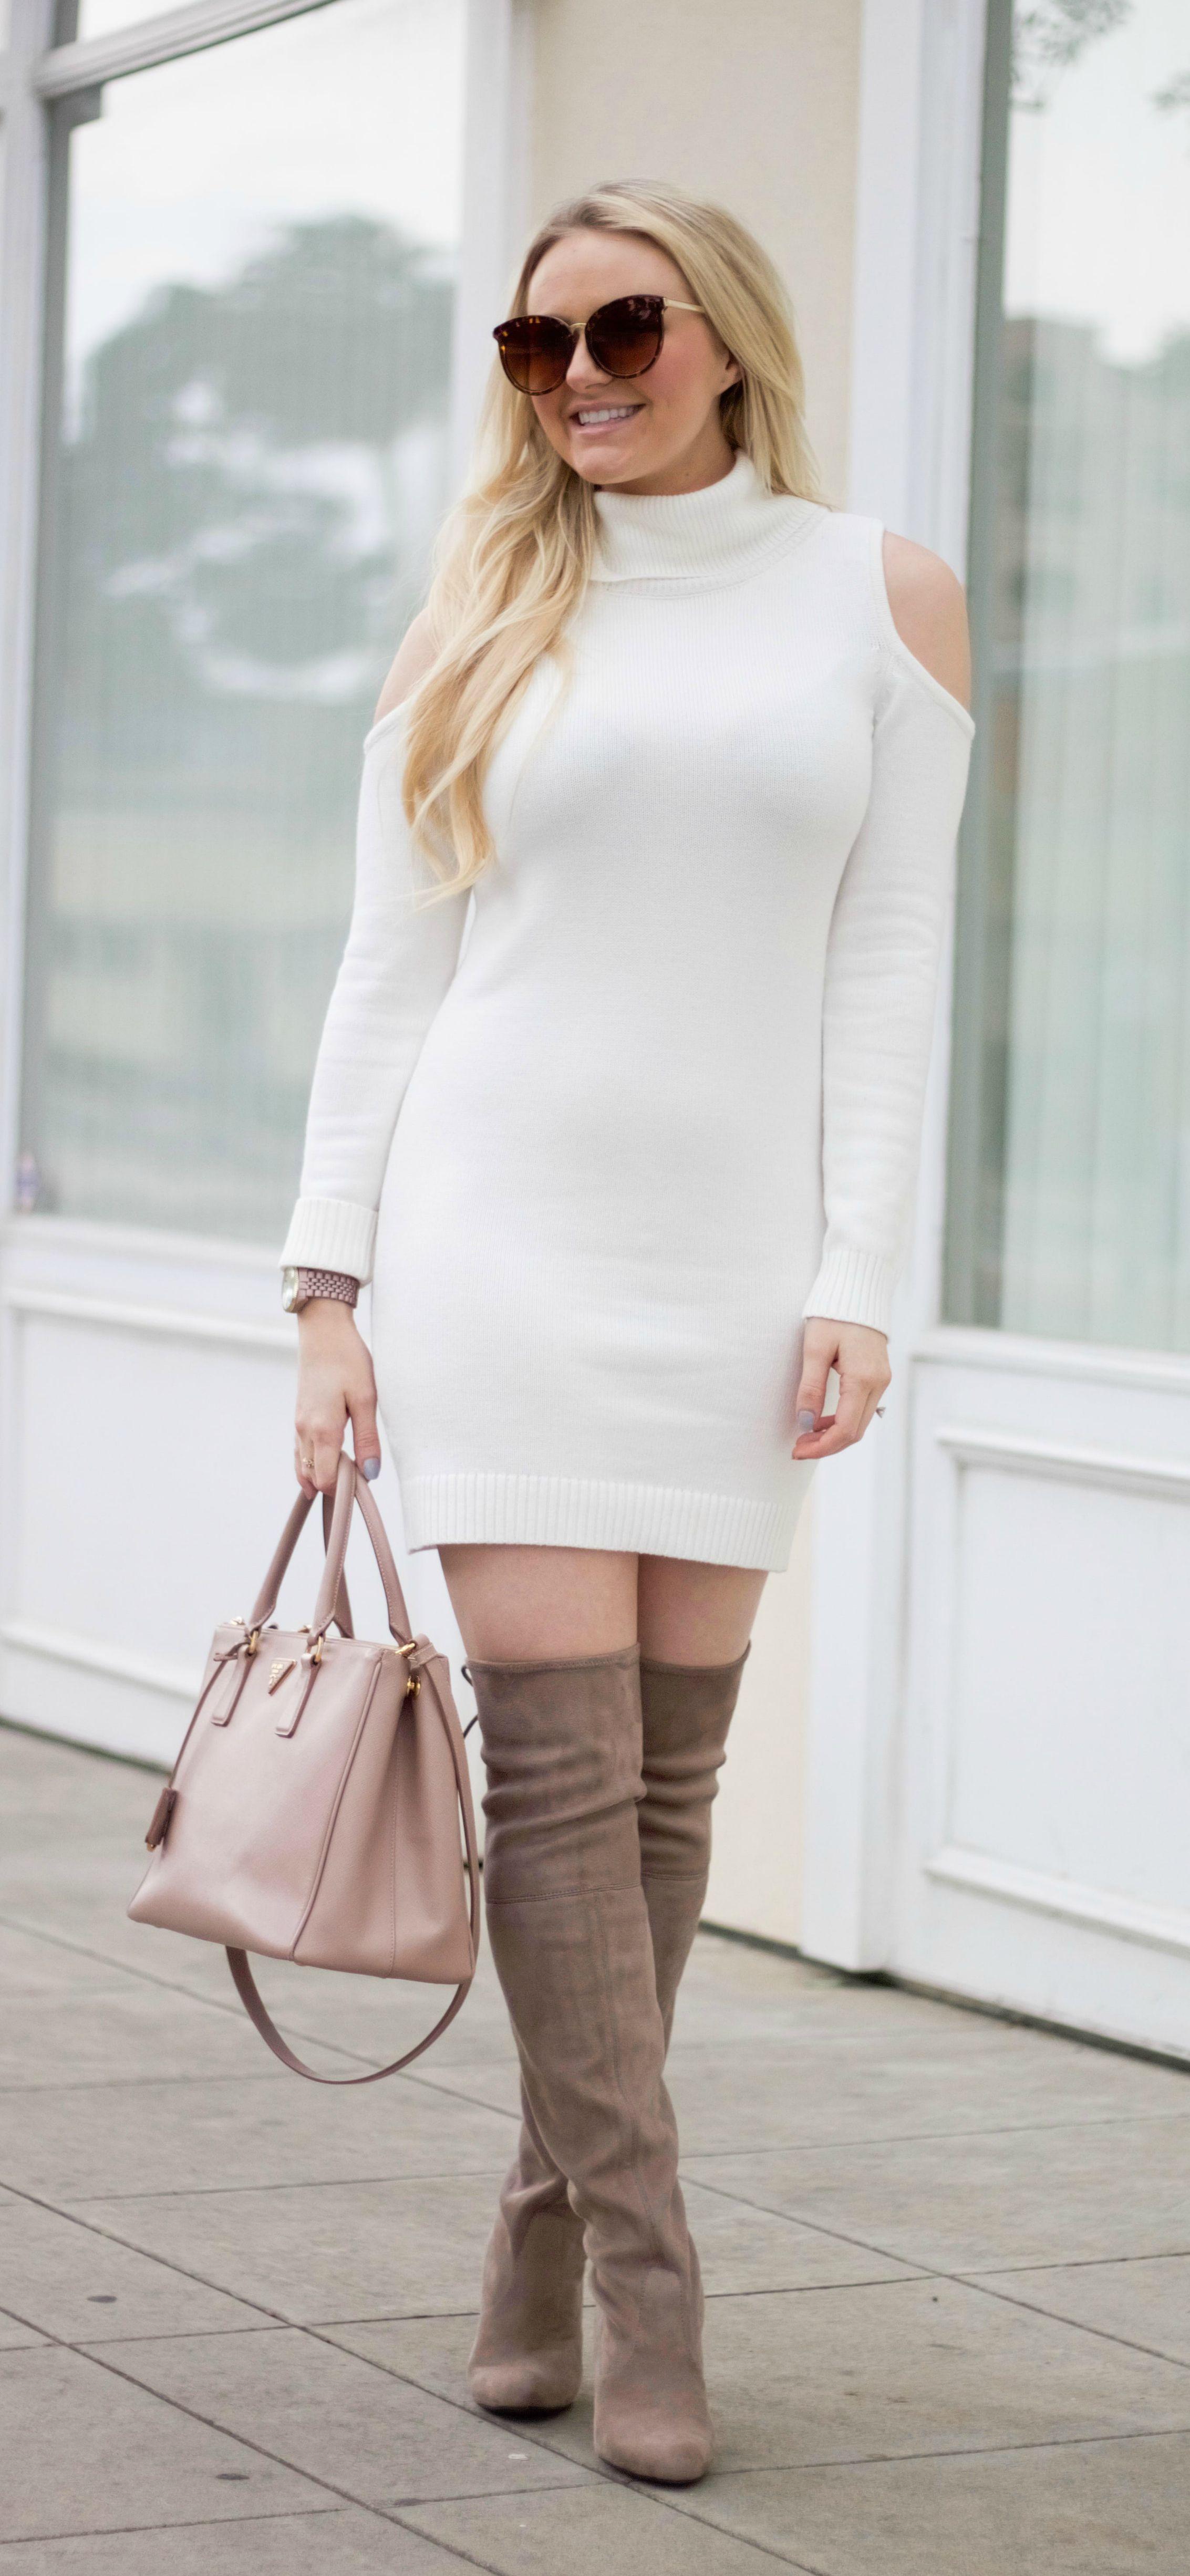 Open Shoulder Turtleneck Dress with Prada Saffiano